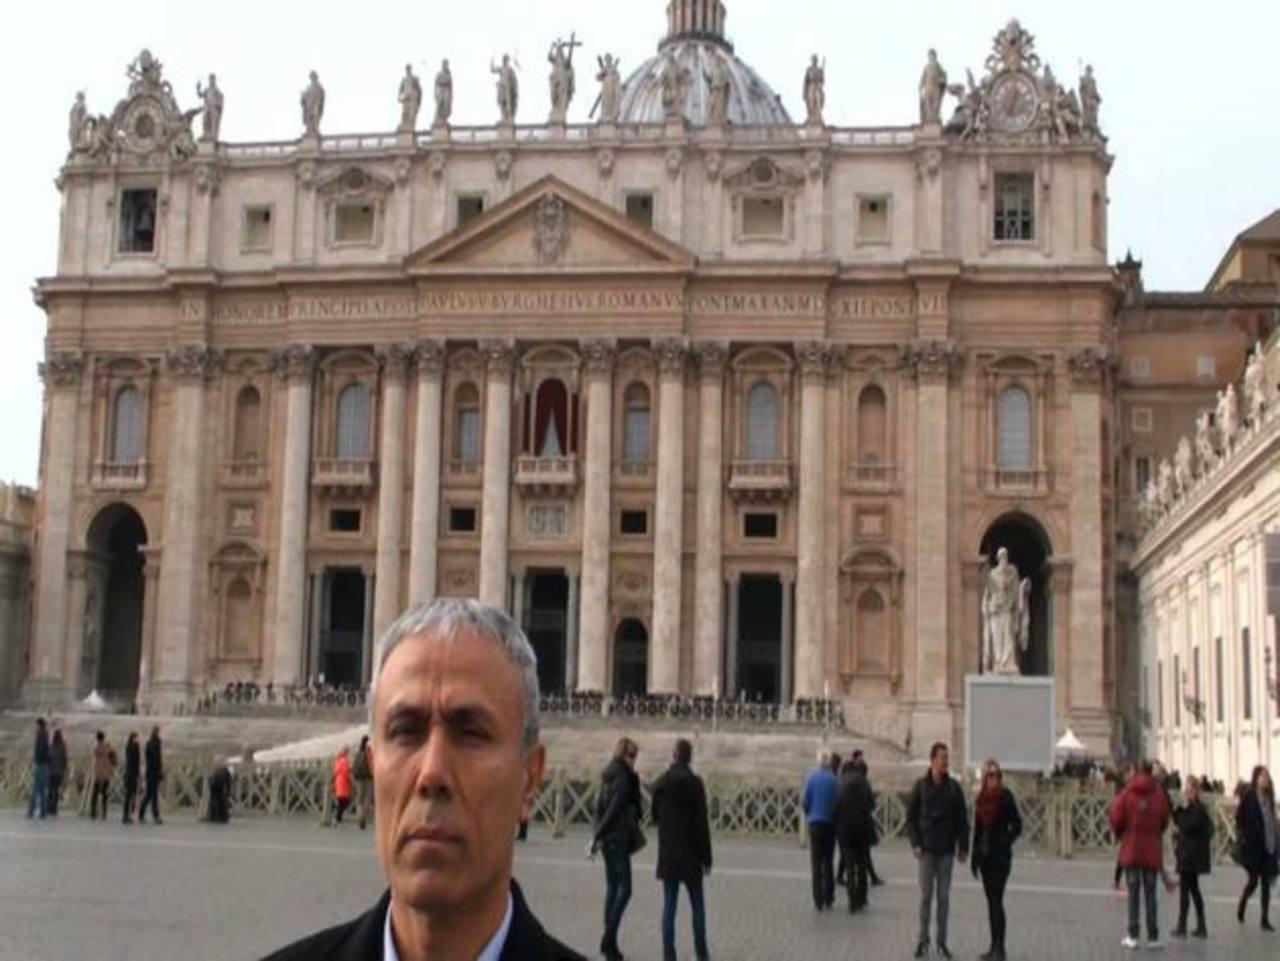 El turco que disparó a Juan Pablo II lleva flores a su tumba en el Vaticano